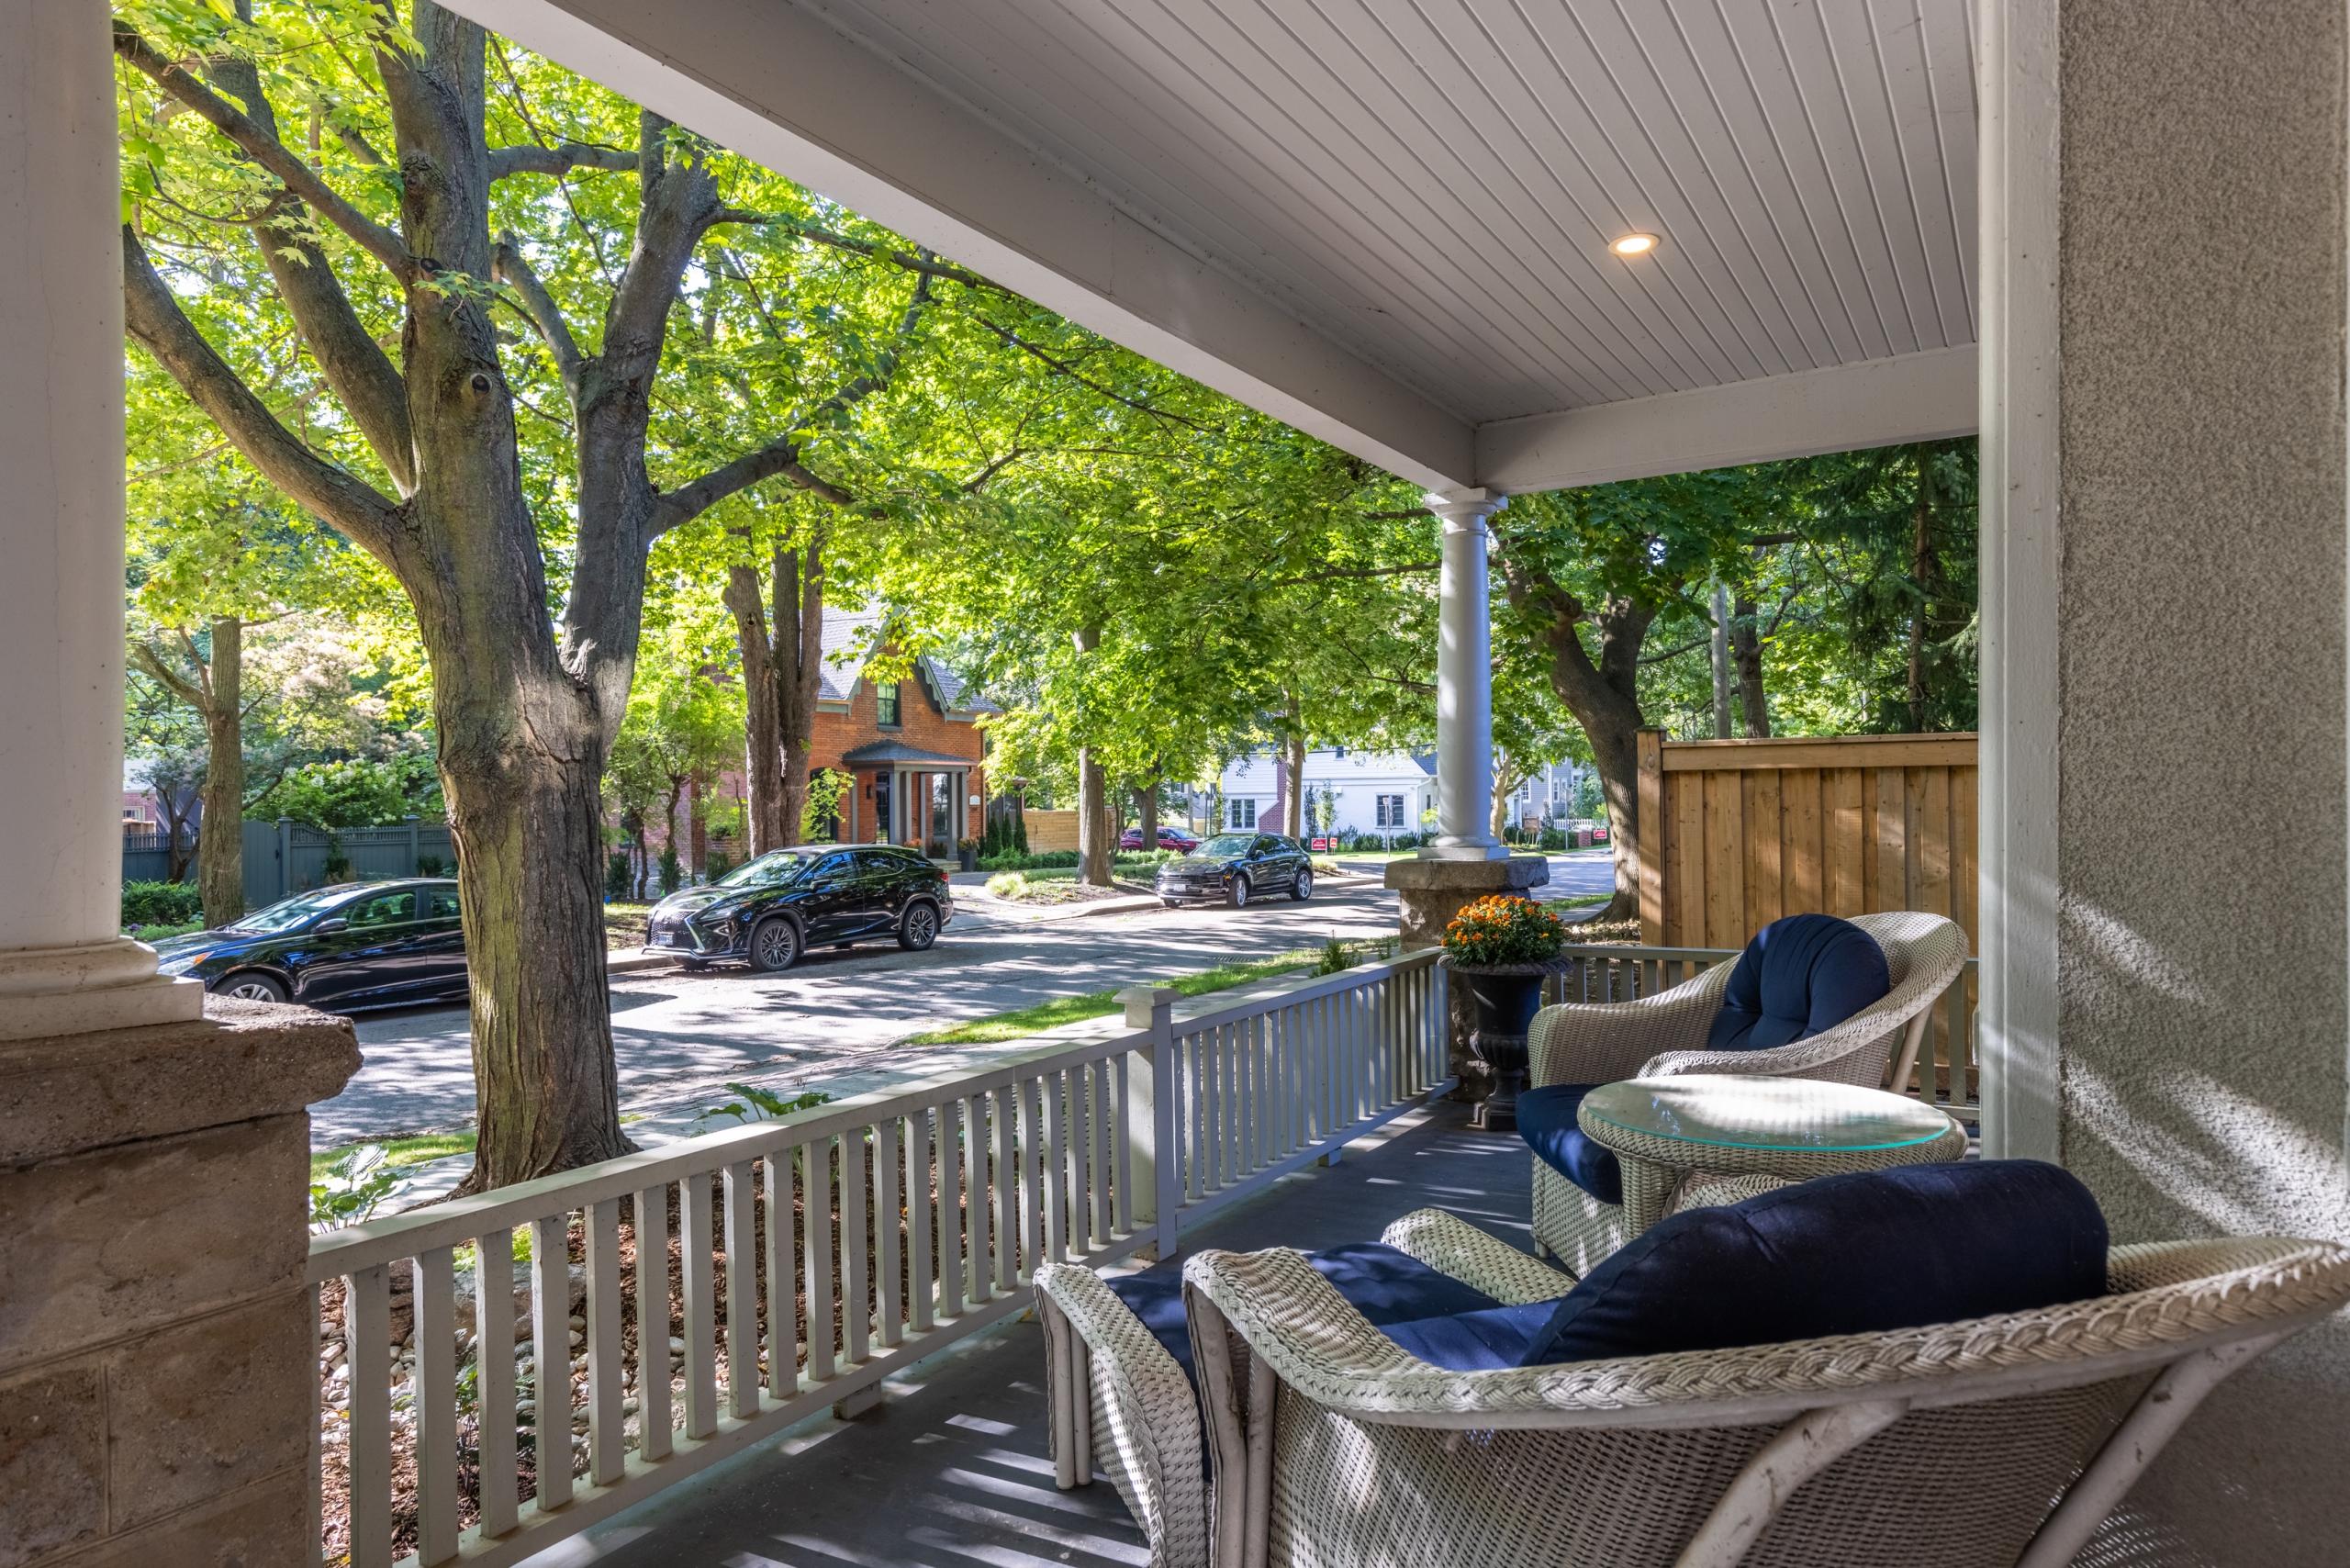 Balcony featured at 295 William Street, Oakville. Alex Irish & Associates